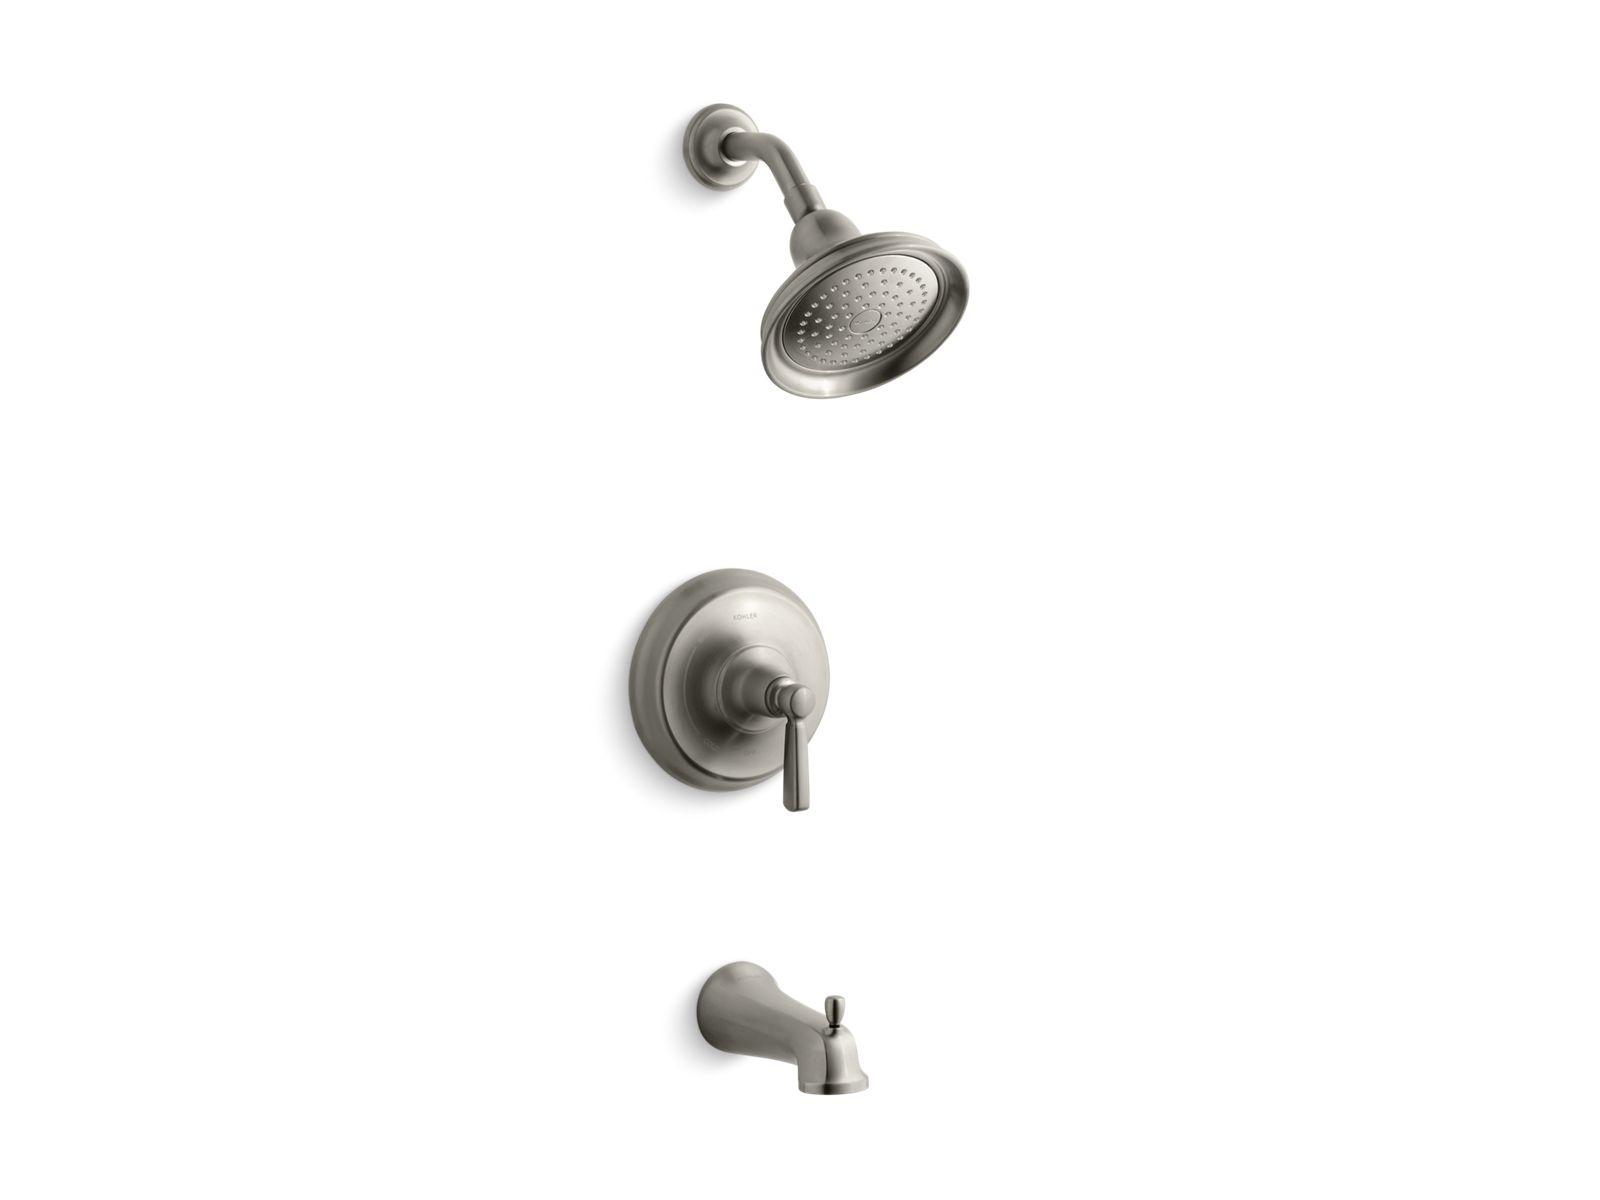 kts105814 bancroft ritetemp bath and shower valve trim with metal lever handle npt spout and 25 gpm showerhead kohler